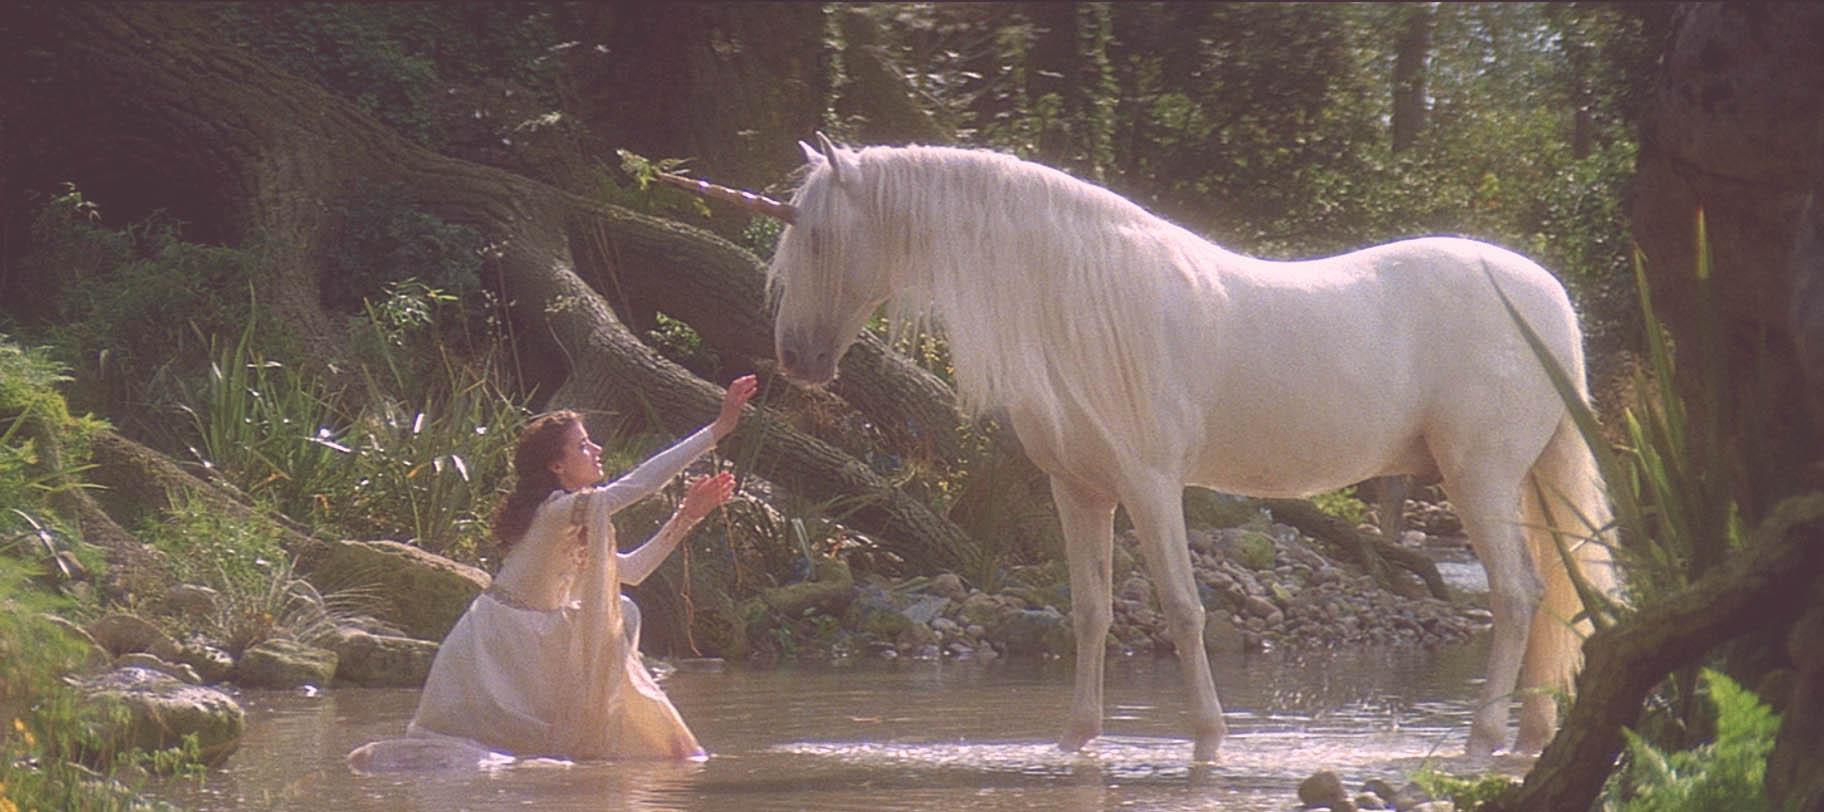 licorne, unicorn, diy licorne, produits licorne, shine